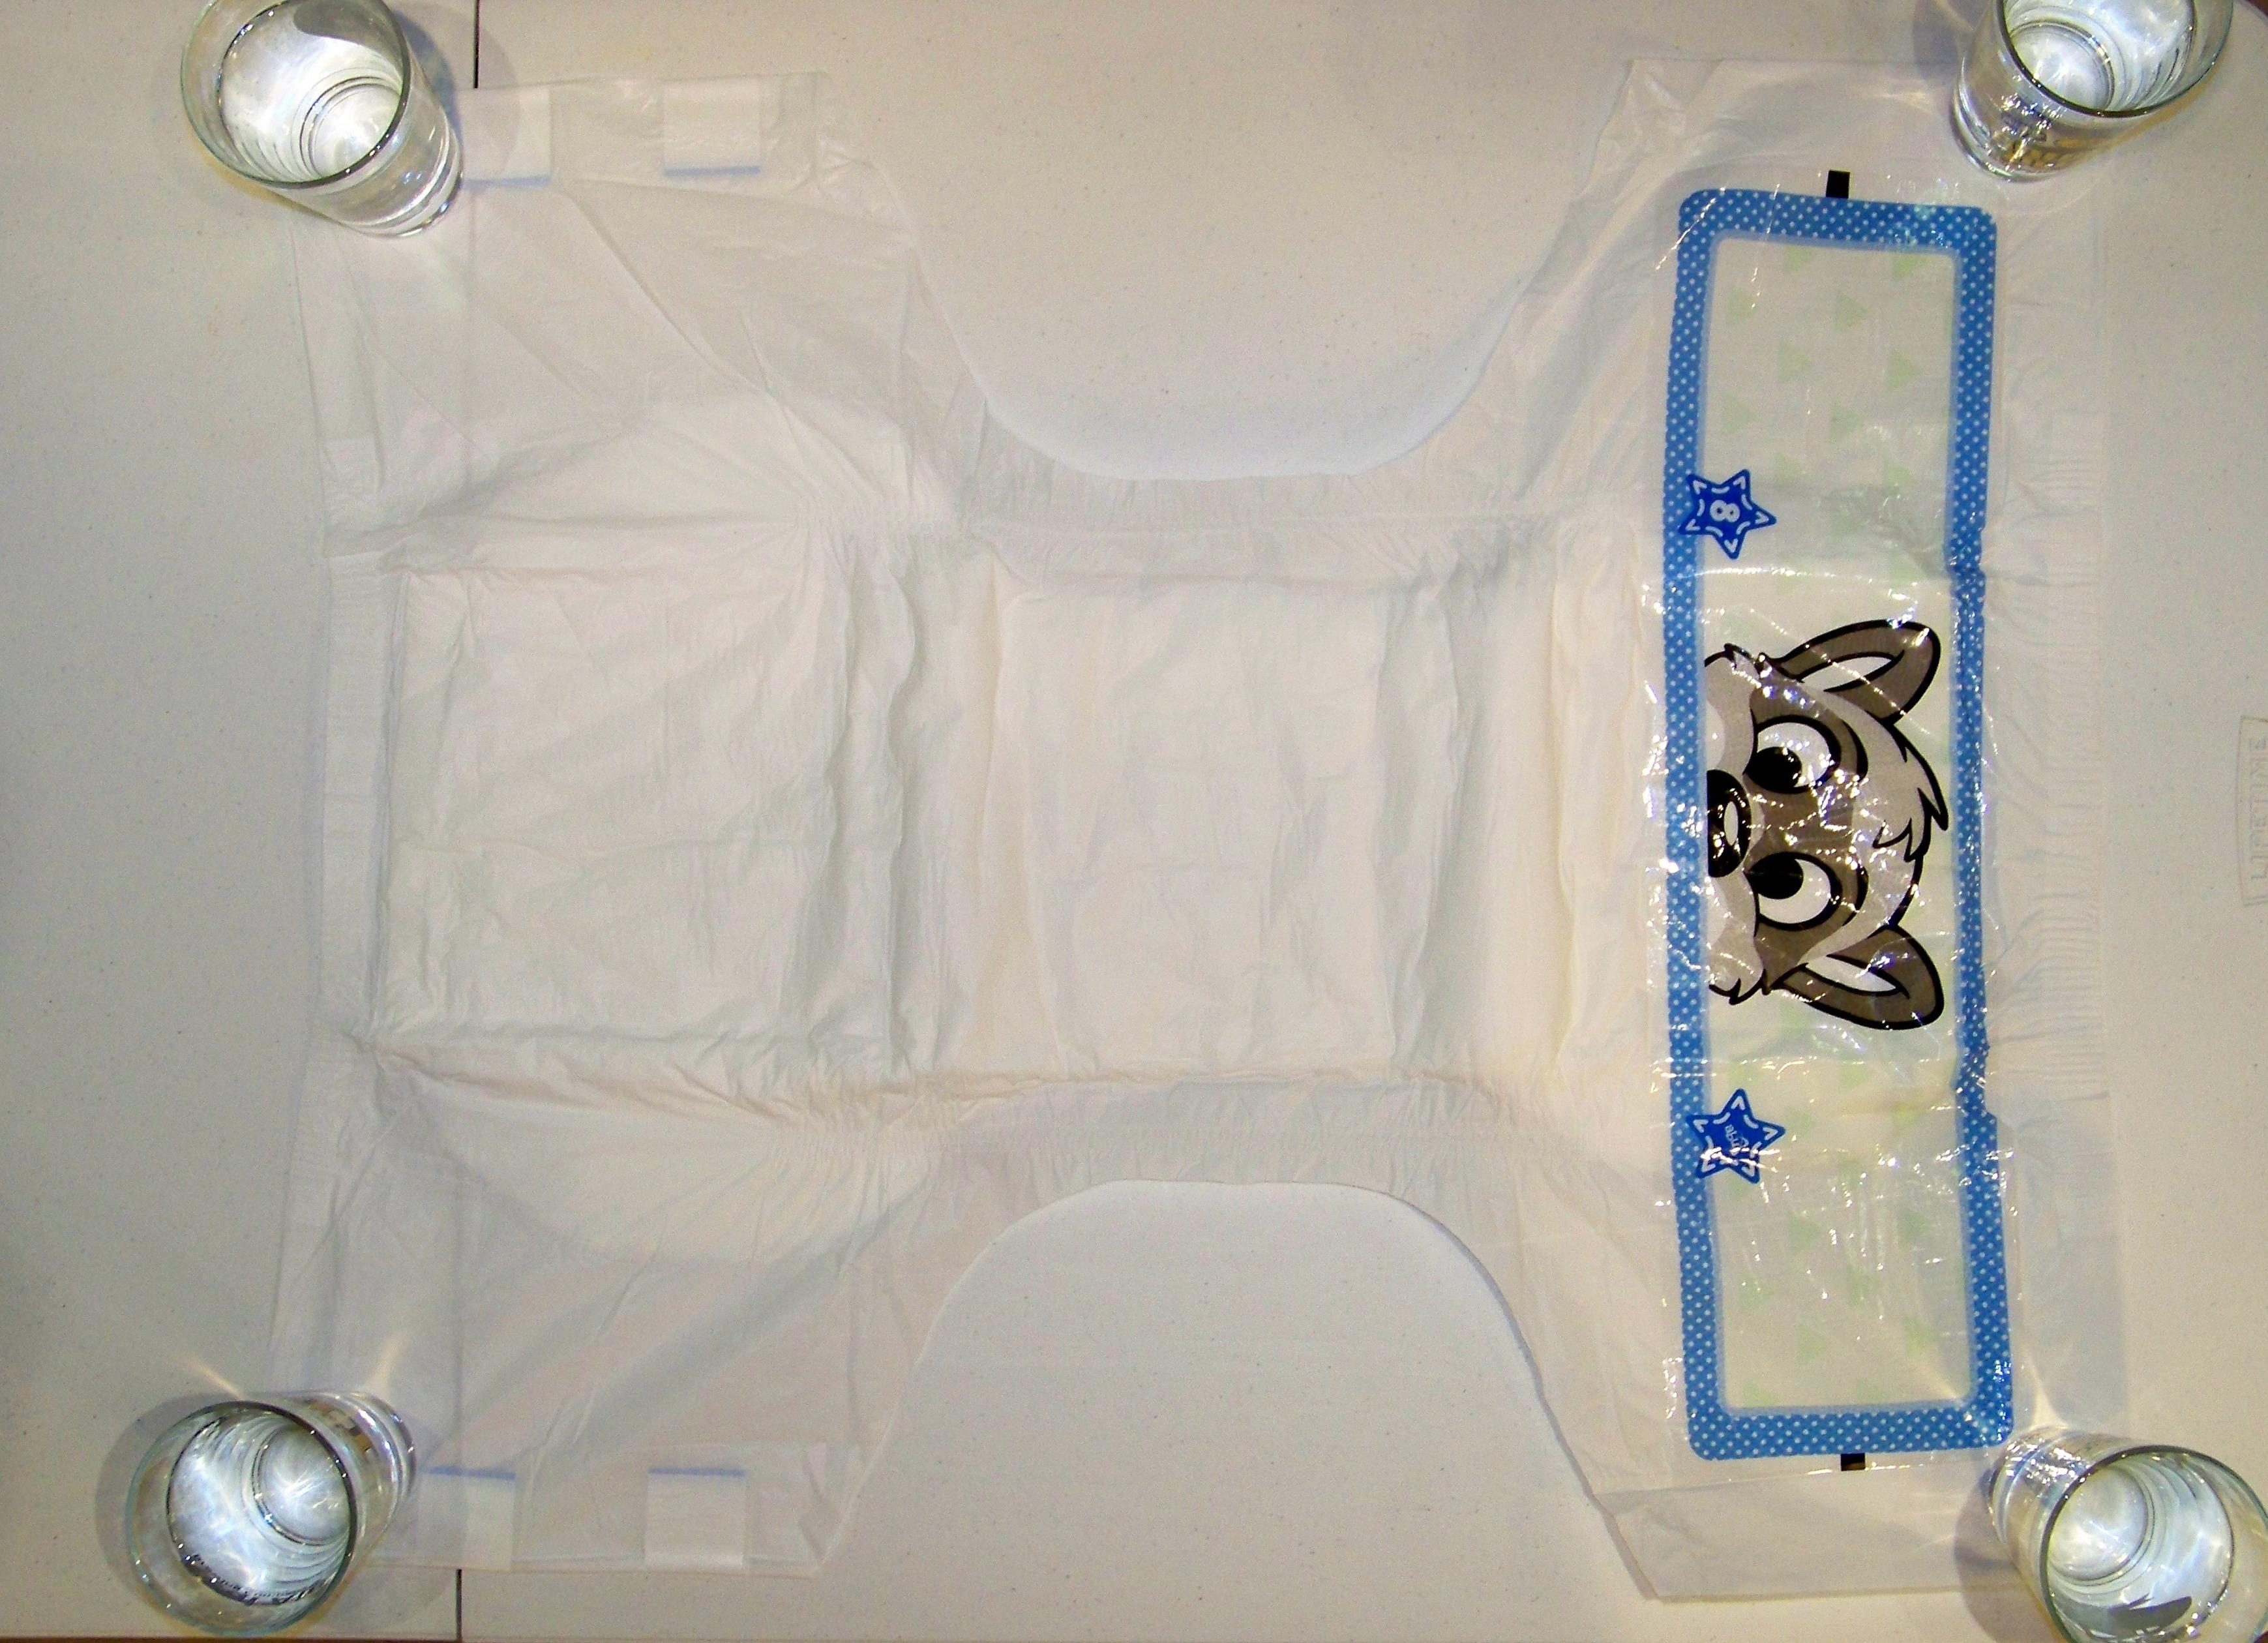 ABUniverse PeekABU Advanced Diaper Review Light Leak